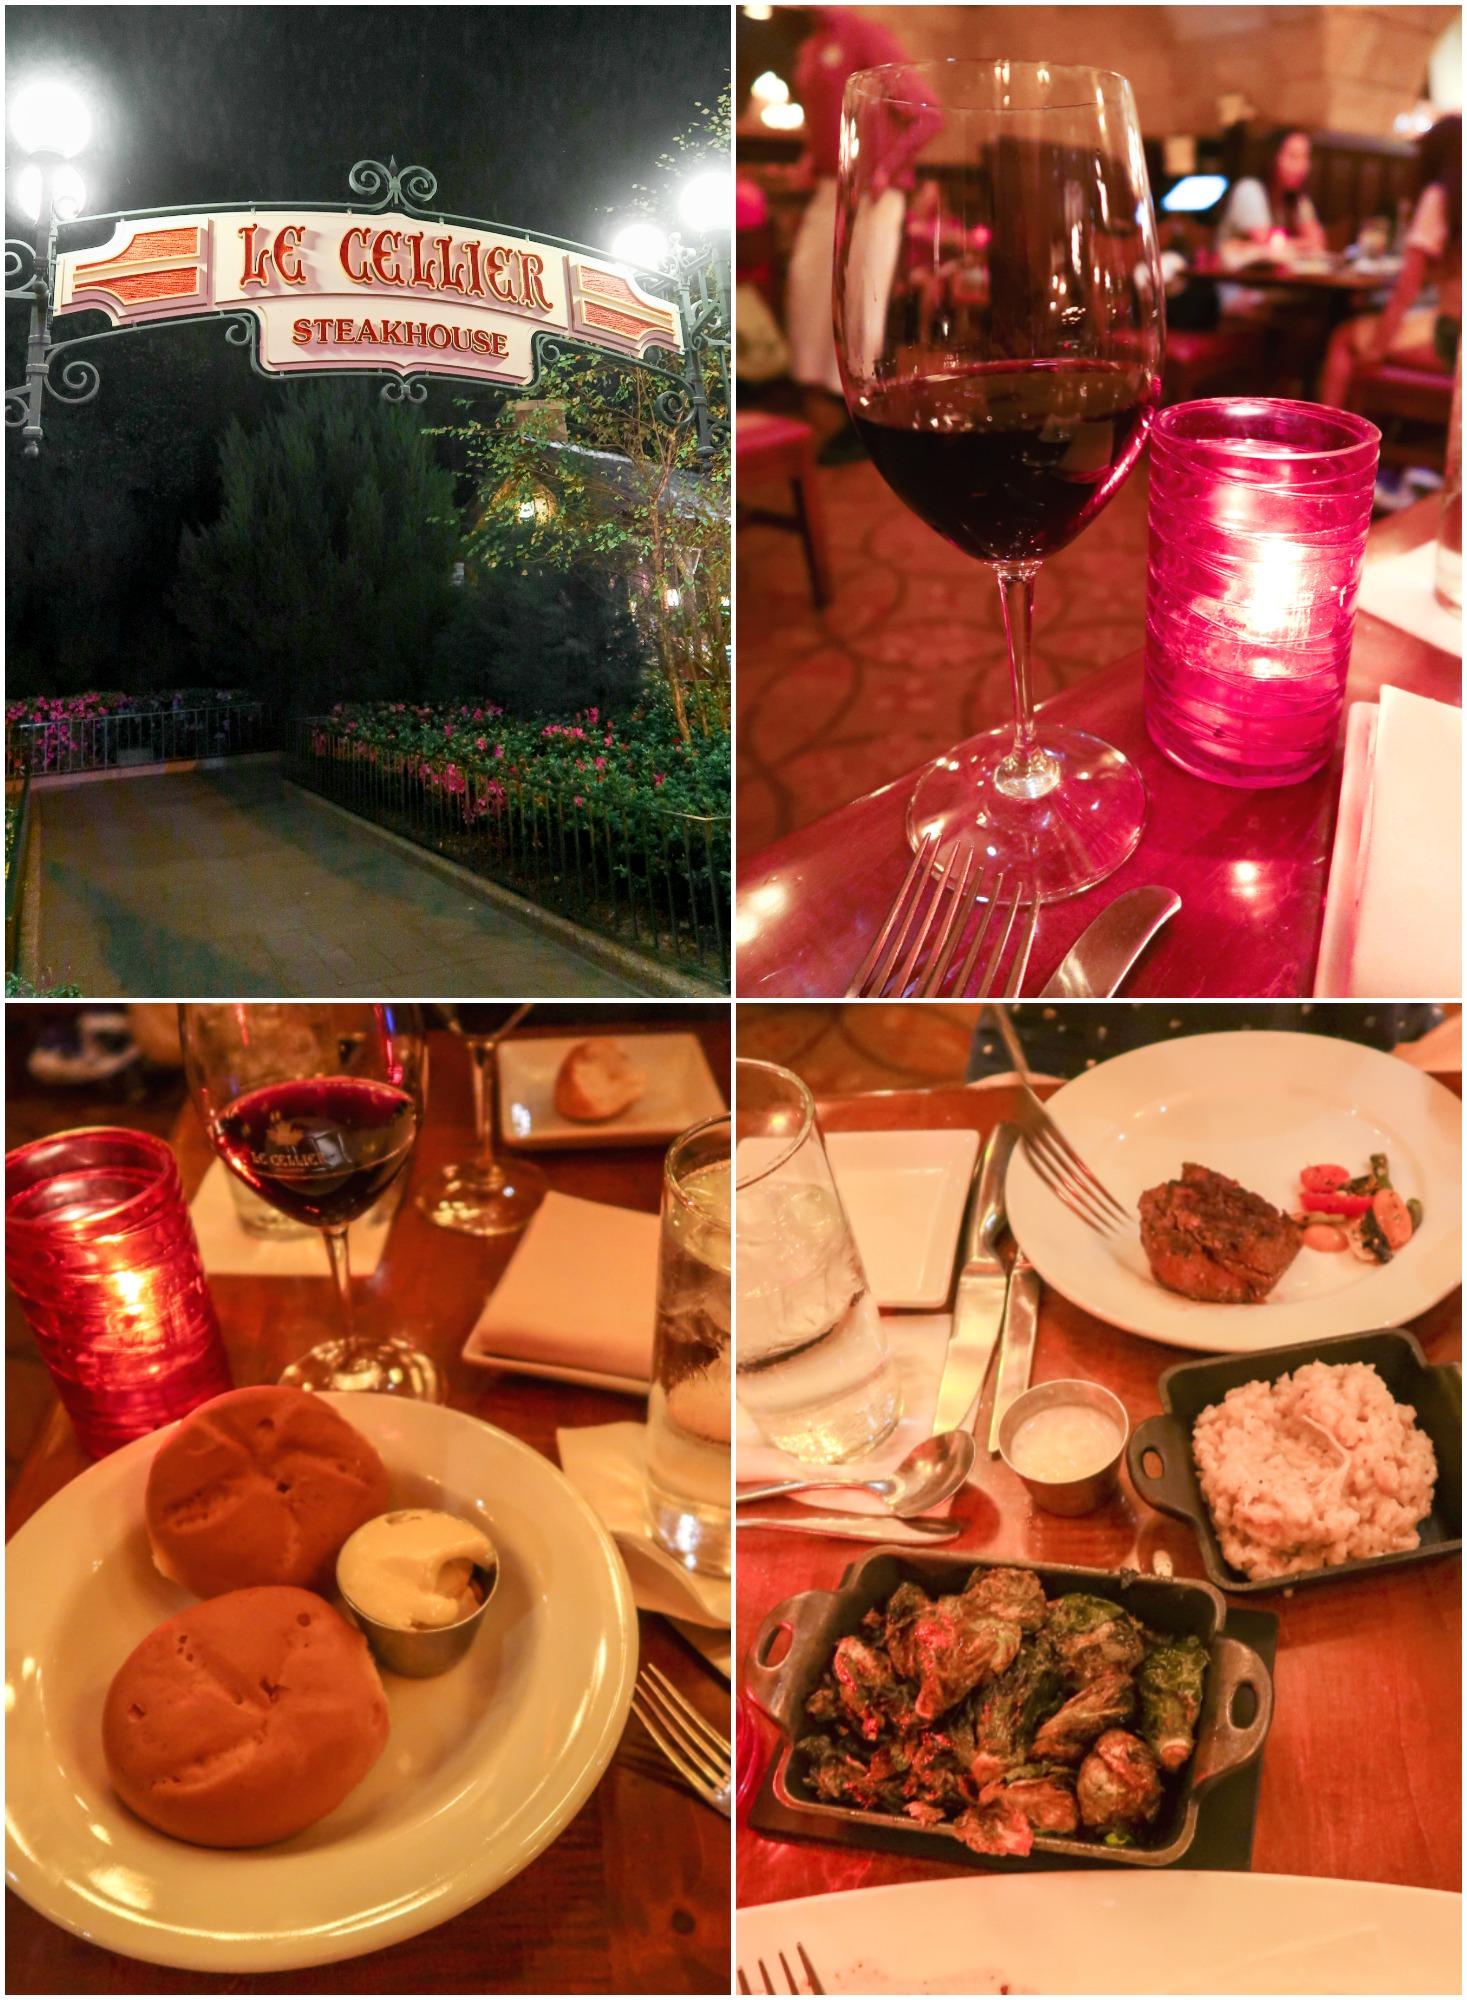 Dinner at Epcot Le Cellier Steakhouse WALT DISNEY WORLD